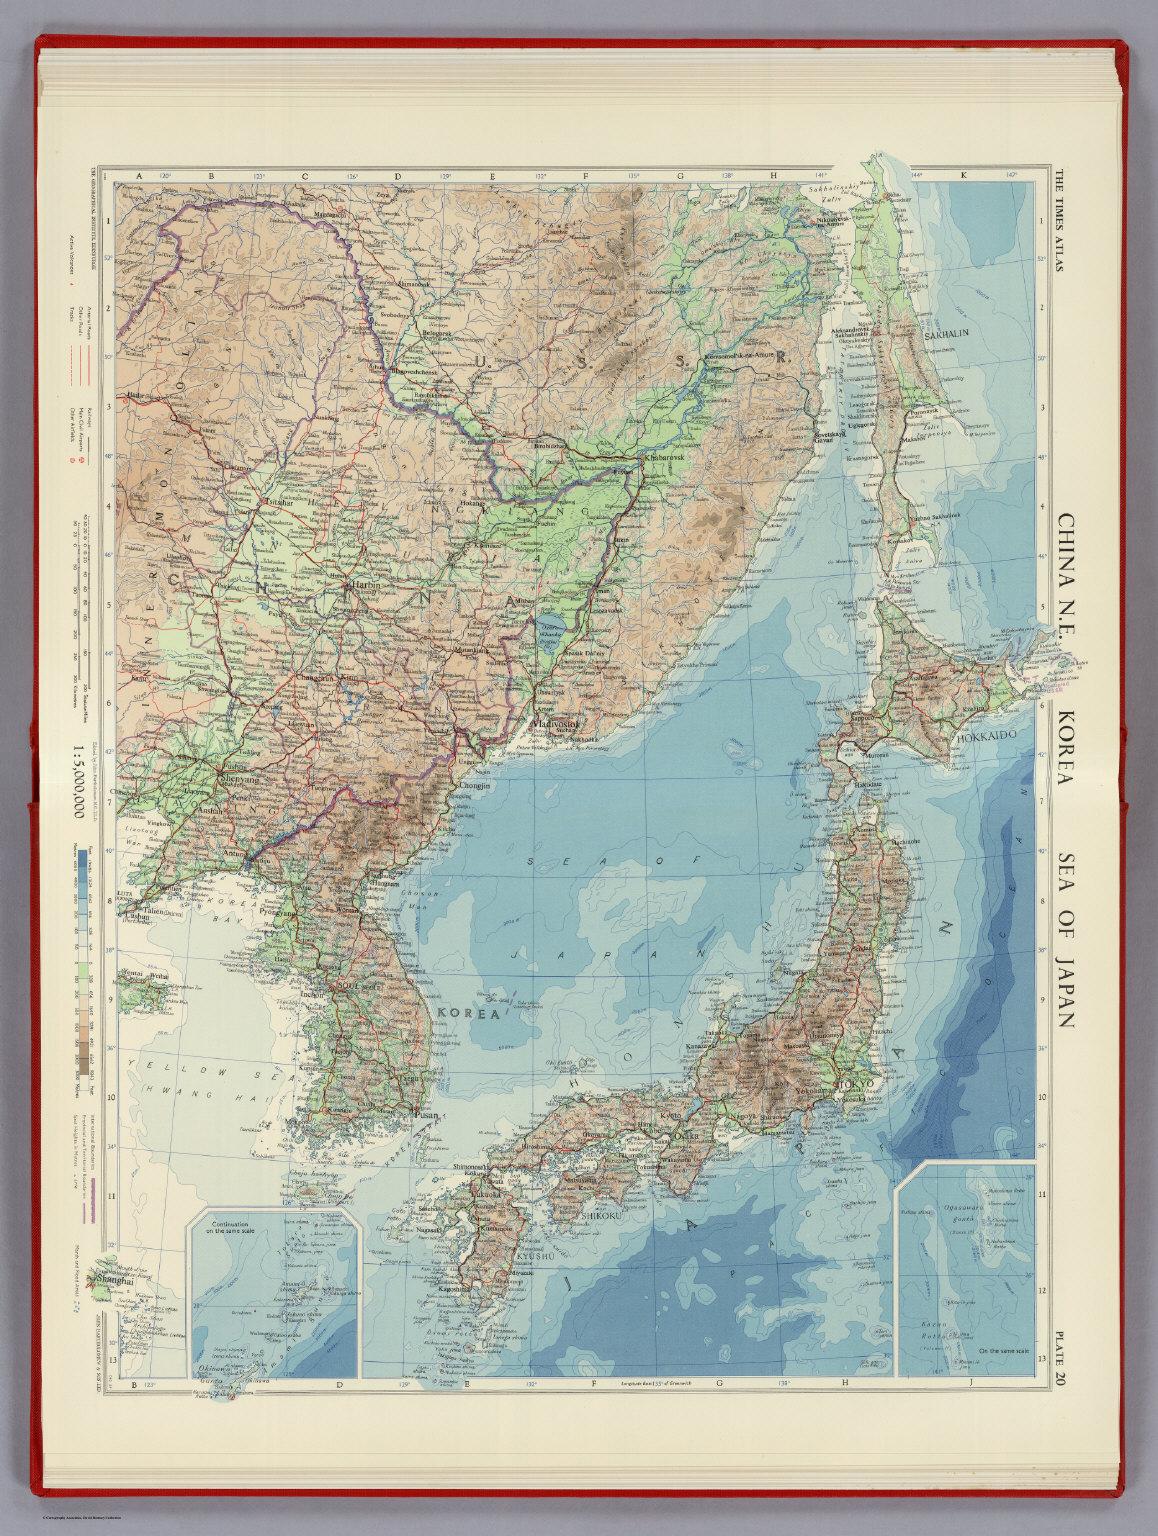 China N.E. Korea Sea Of Japan. Plate 20, V.1